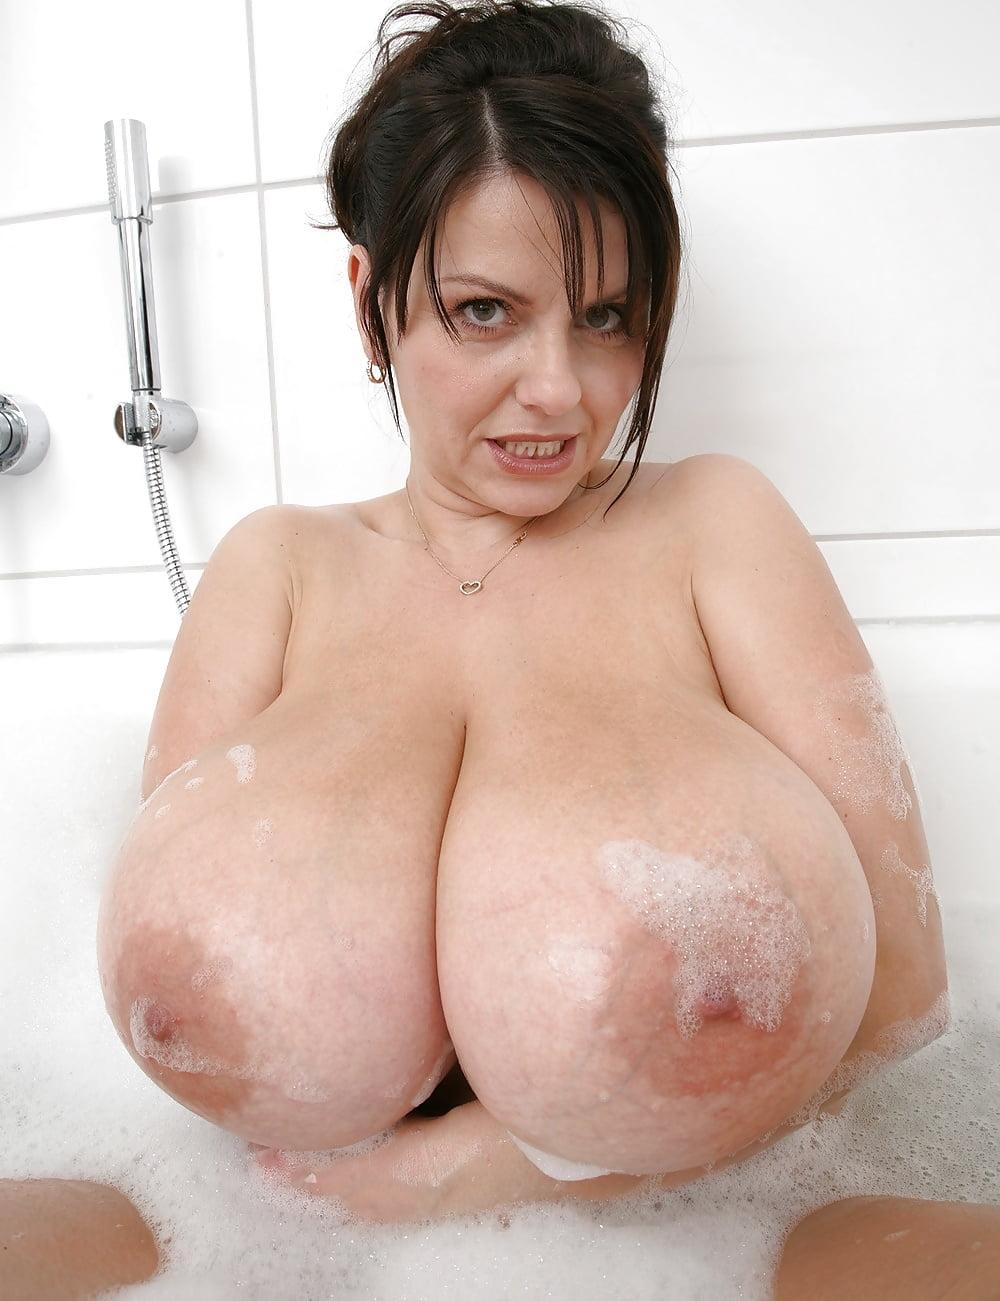 Big tits girls pics